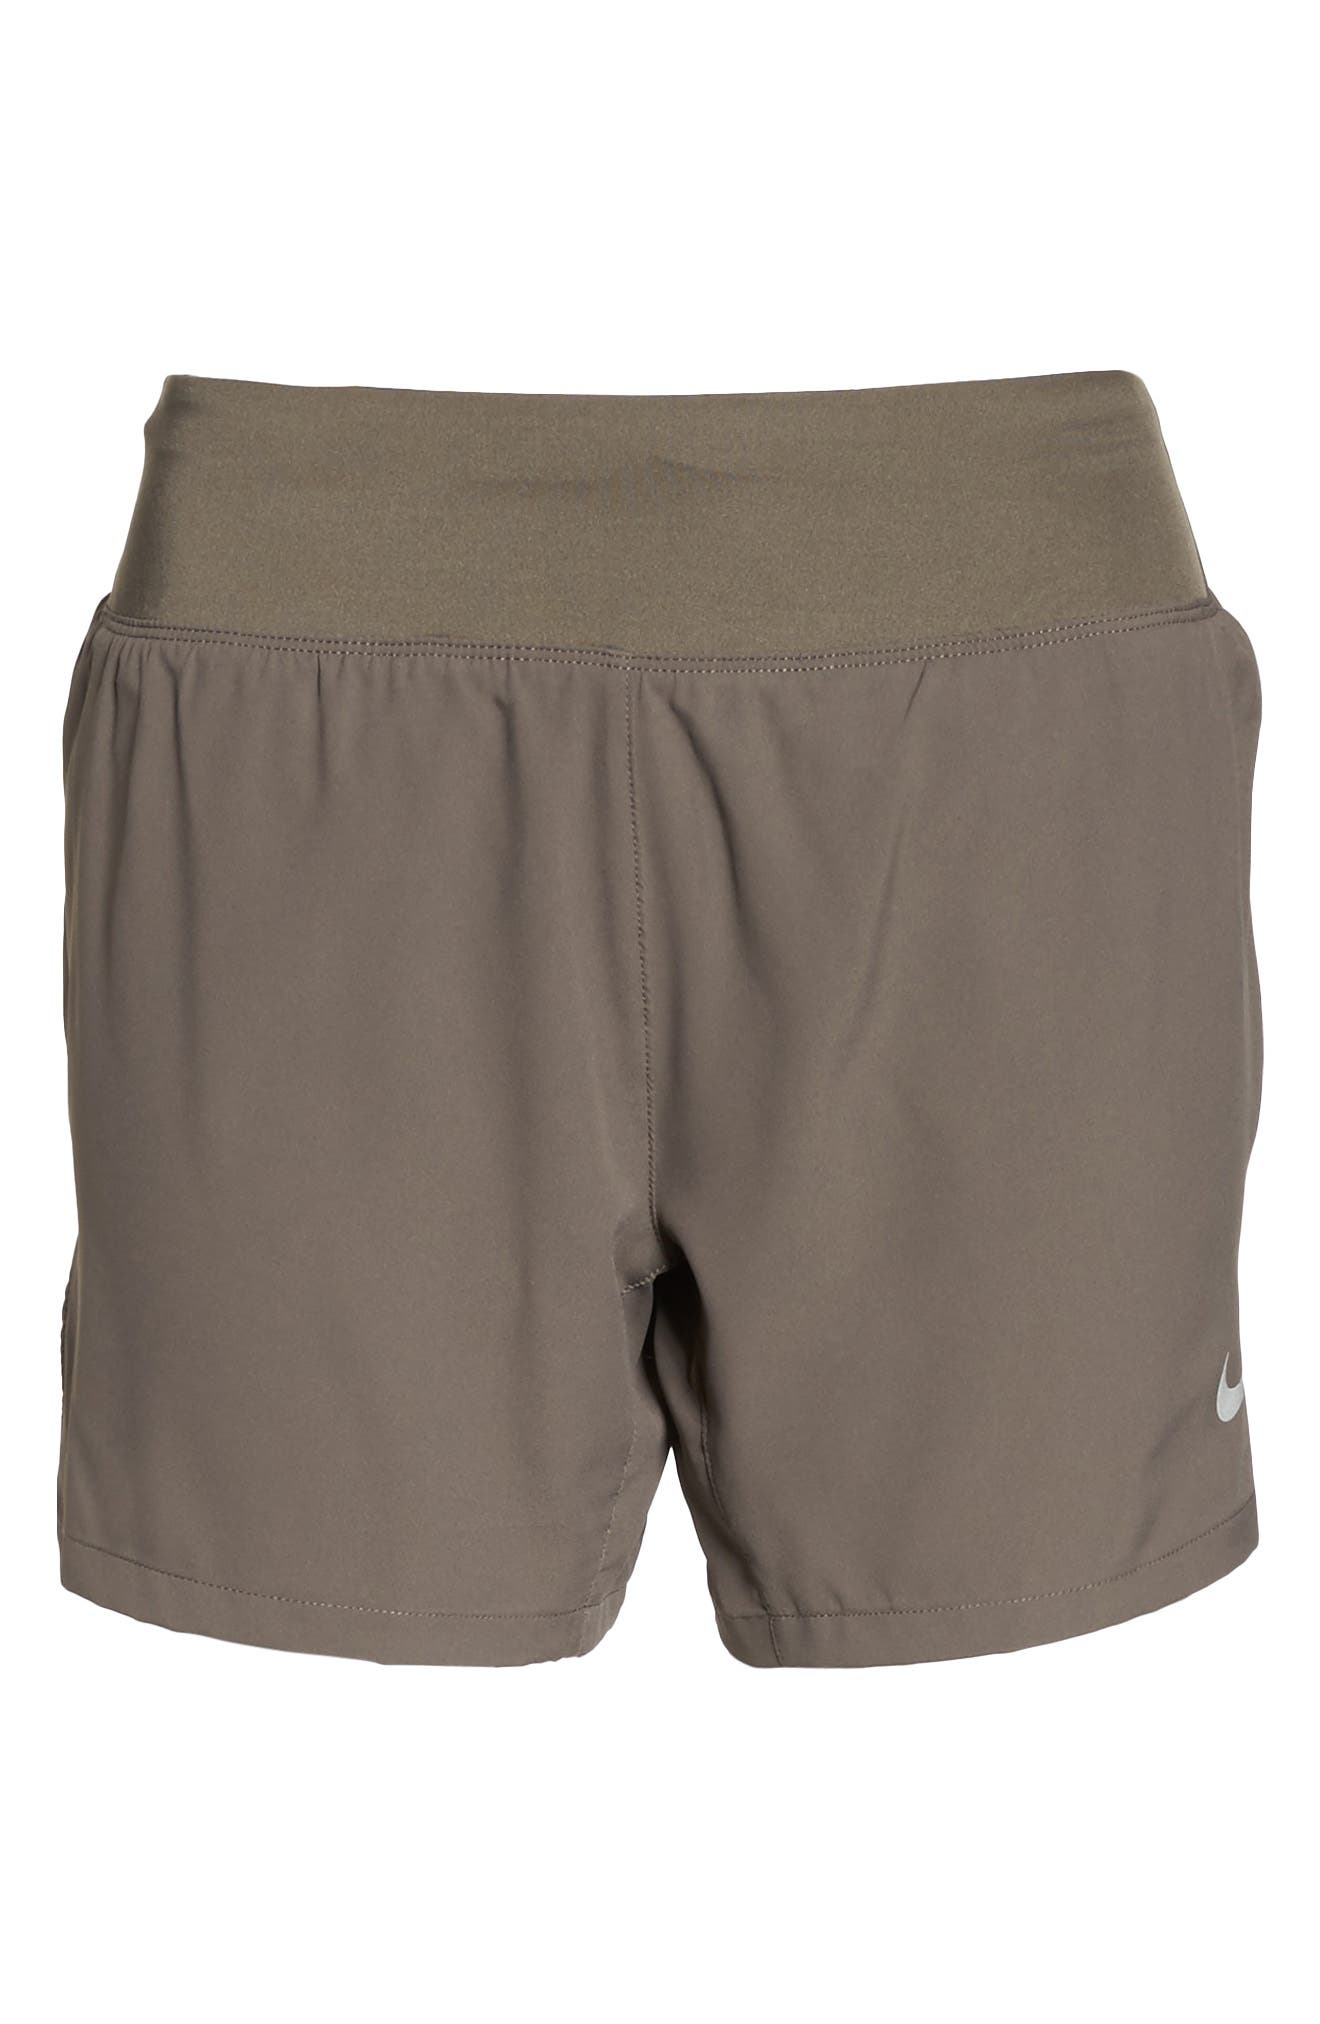 Flex Dri-FIT Running Shorts,                             Alternate thumbnail 7, color,                             Ridgerock